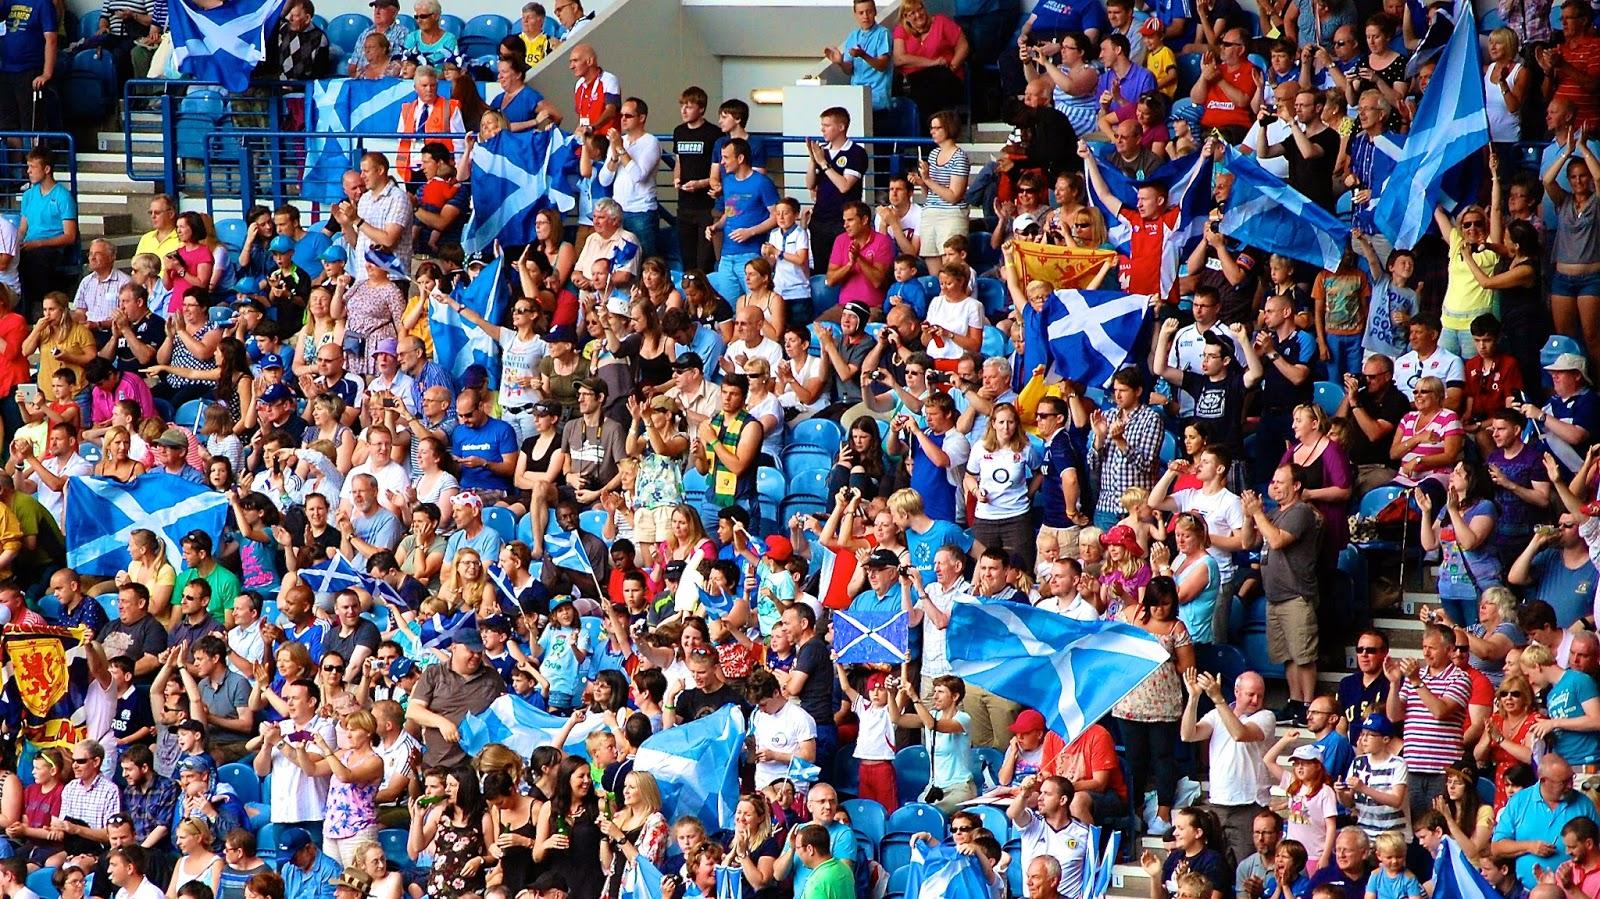 Scottish flags; the Saltire